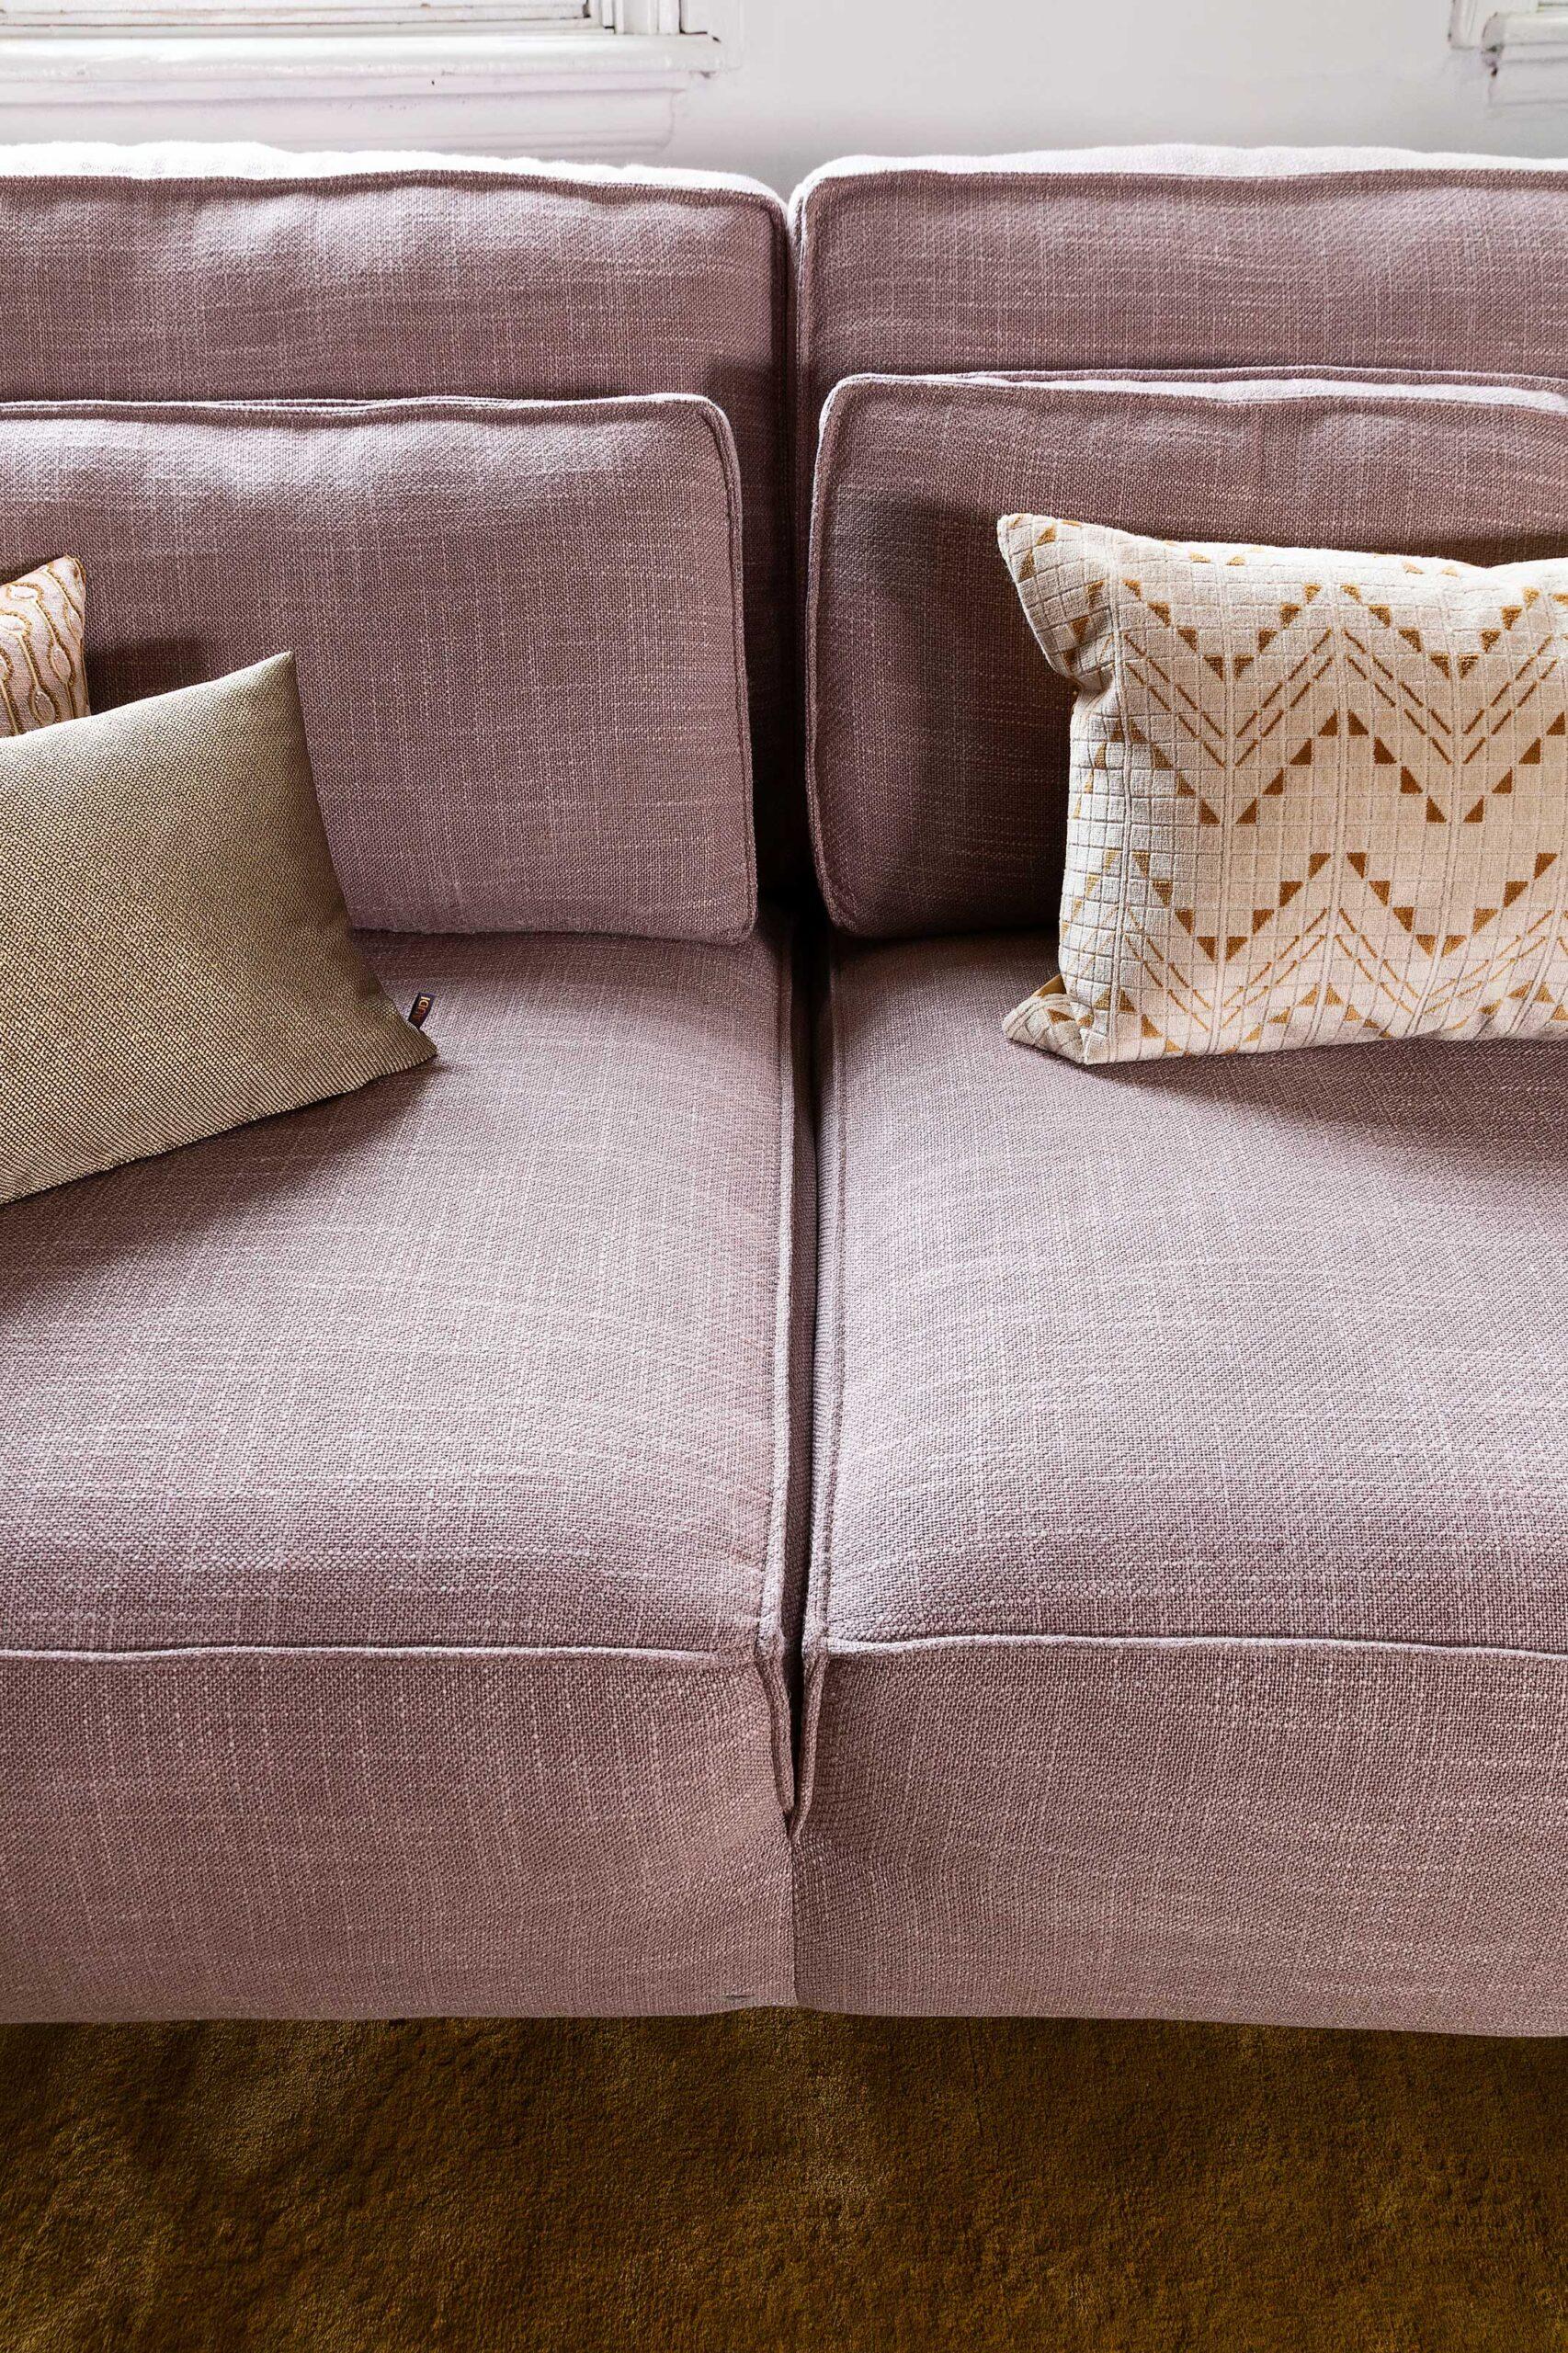 vivre-de-provence-bank-grove-linnen-kleur-stof-detail-lendekussens-soofs-interieur